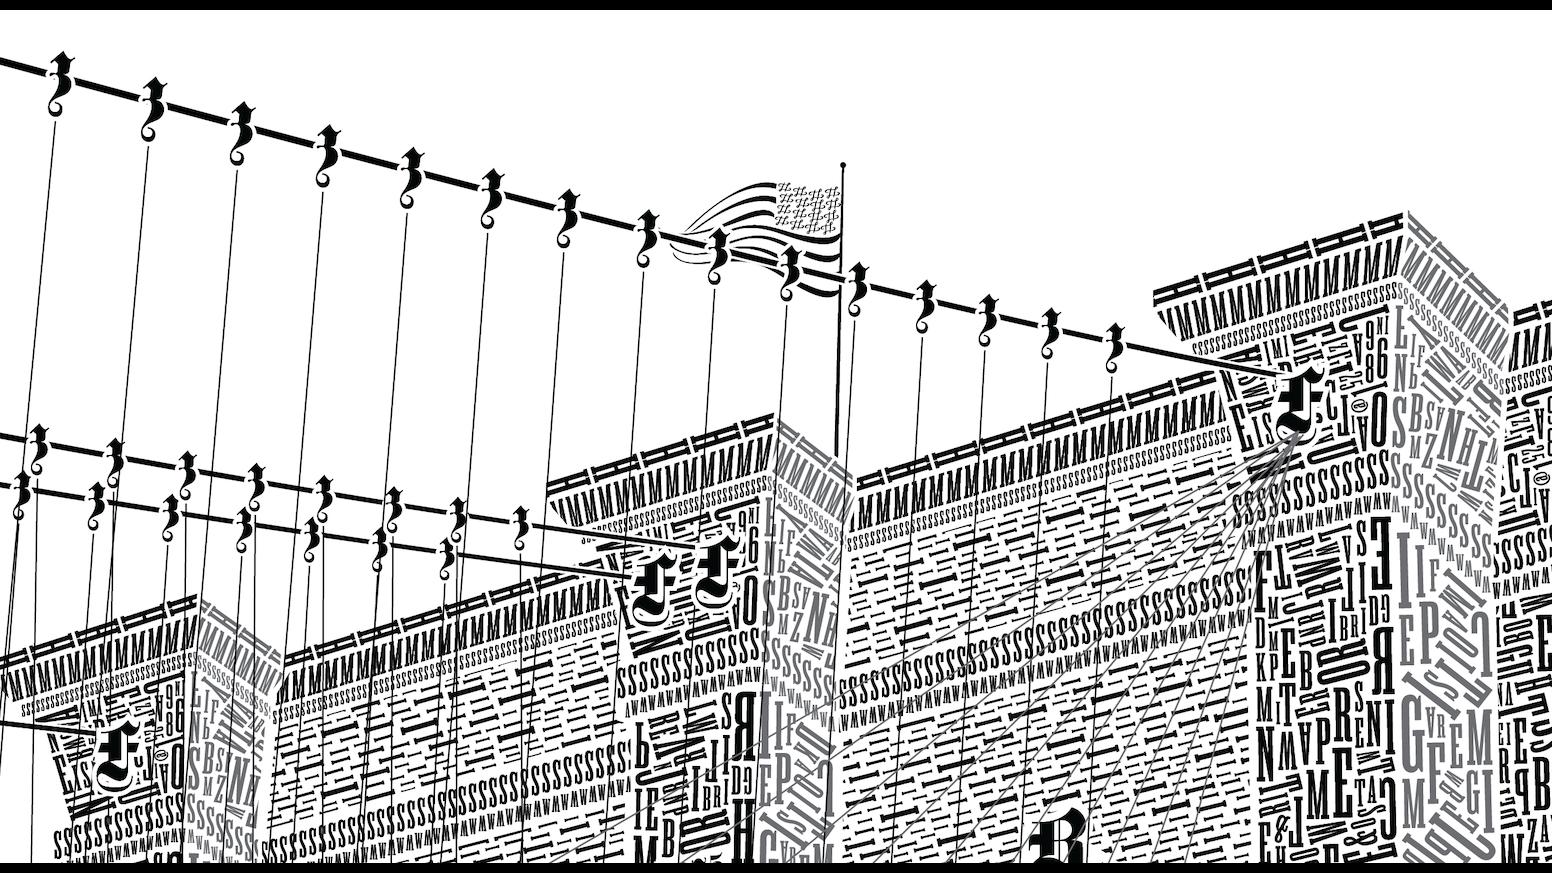 One Line Ascii Art Eyes : The brooklyn bridge in letterpress type by cameron moll